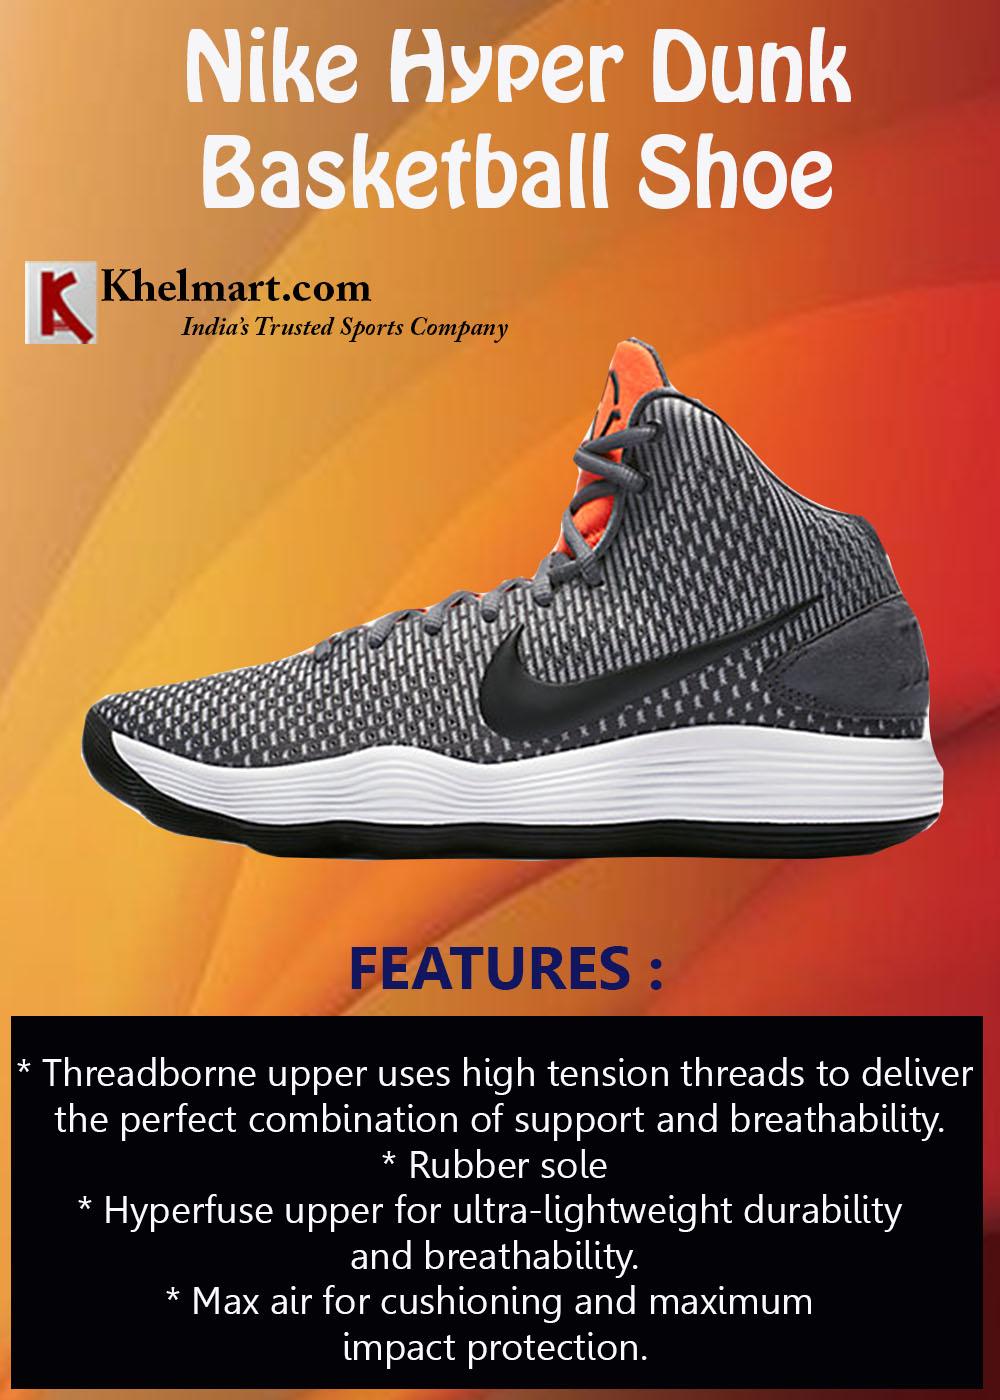 Nike Hyper Dunk Basketball Shoe